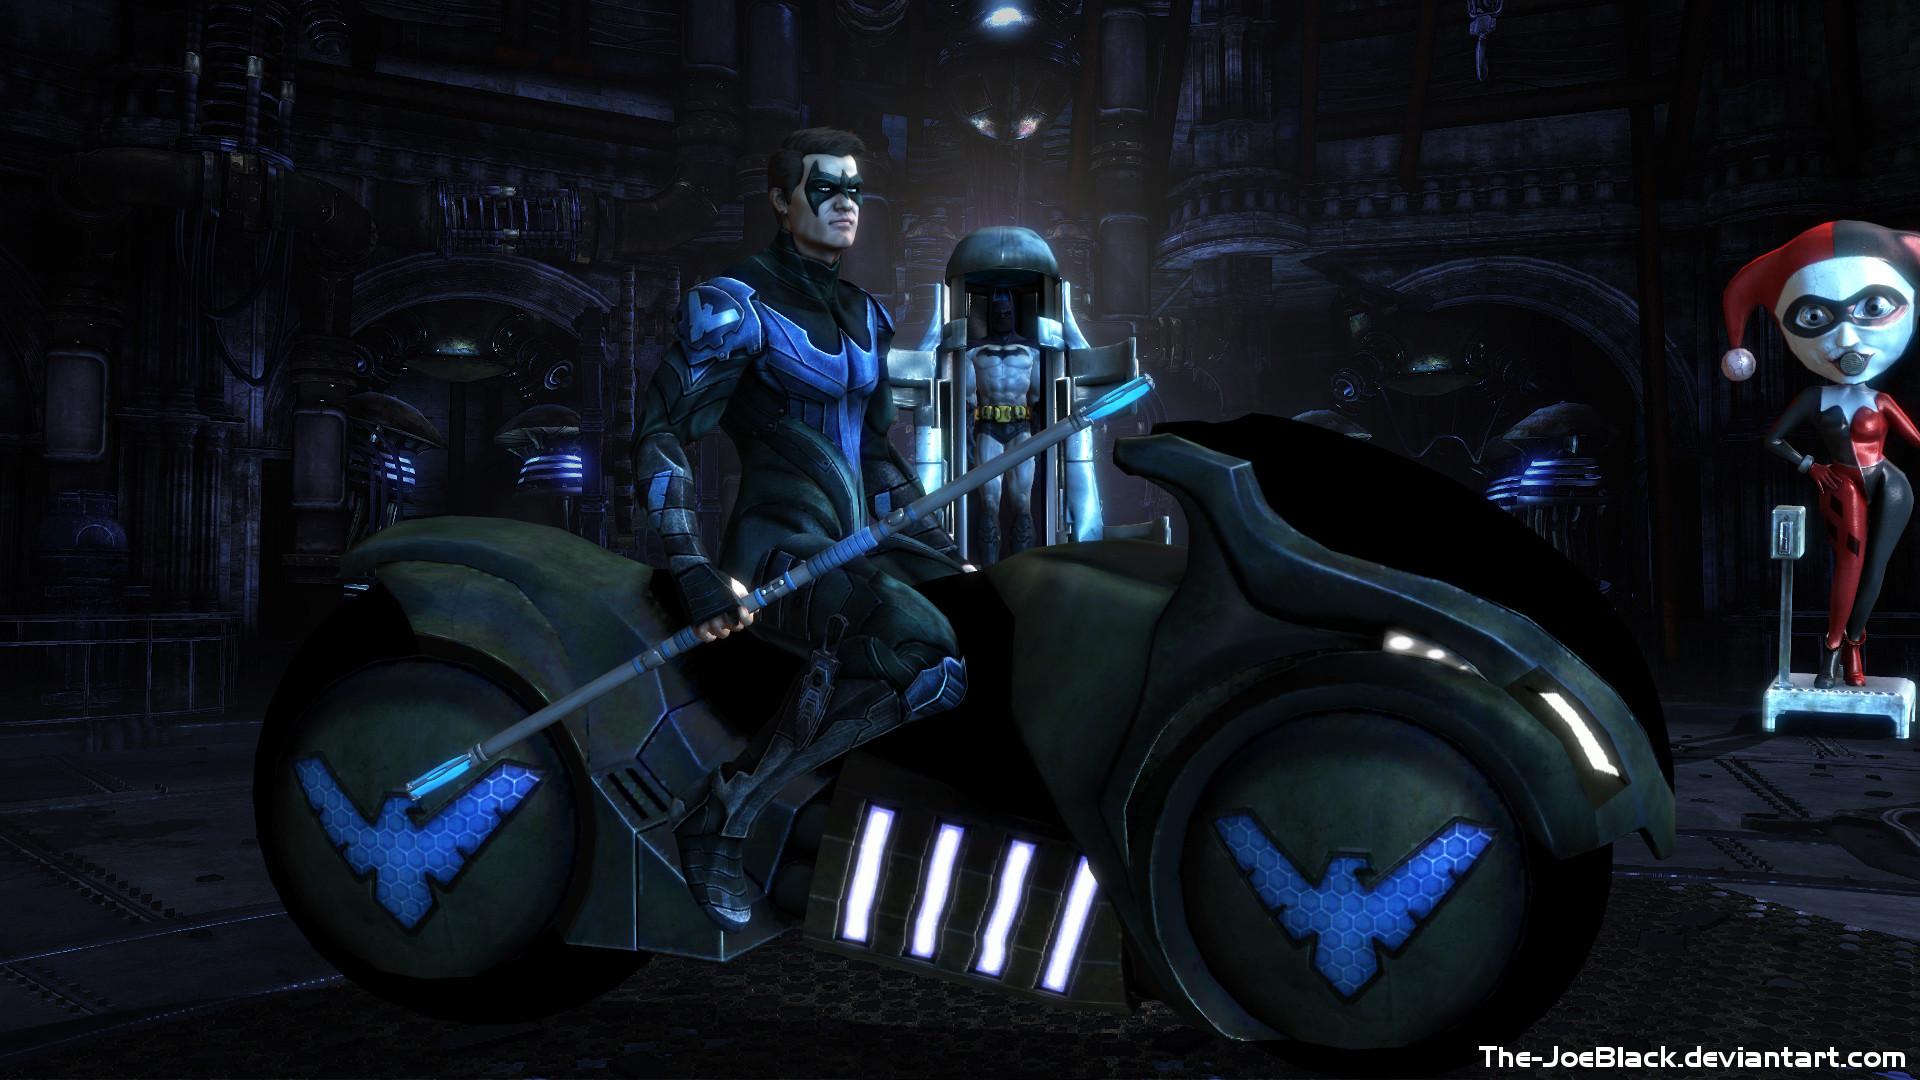 Injustice: Nightwing wallpaper by The-JoeBlack on DeviantArt